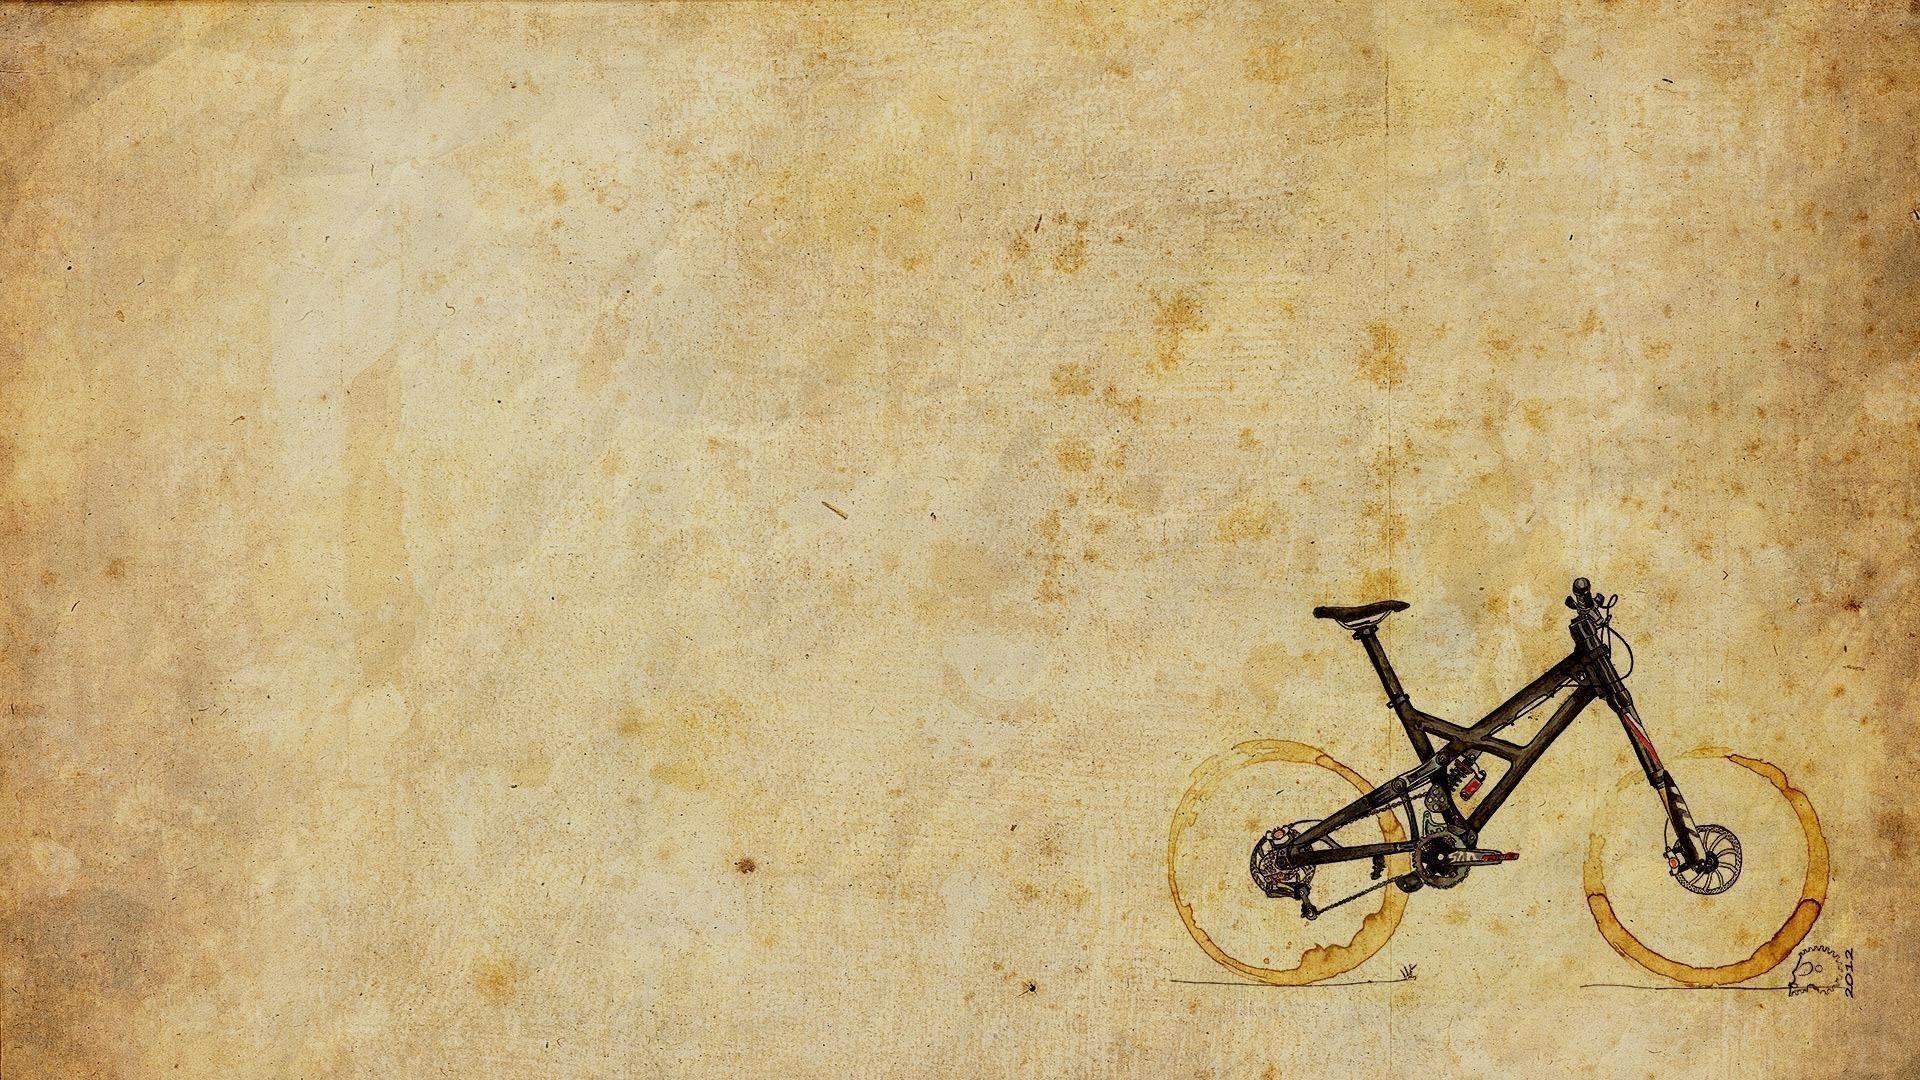 Bicycle Wall Art - Elitflat